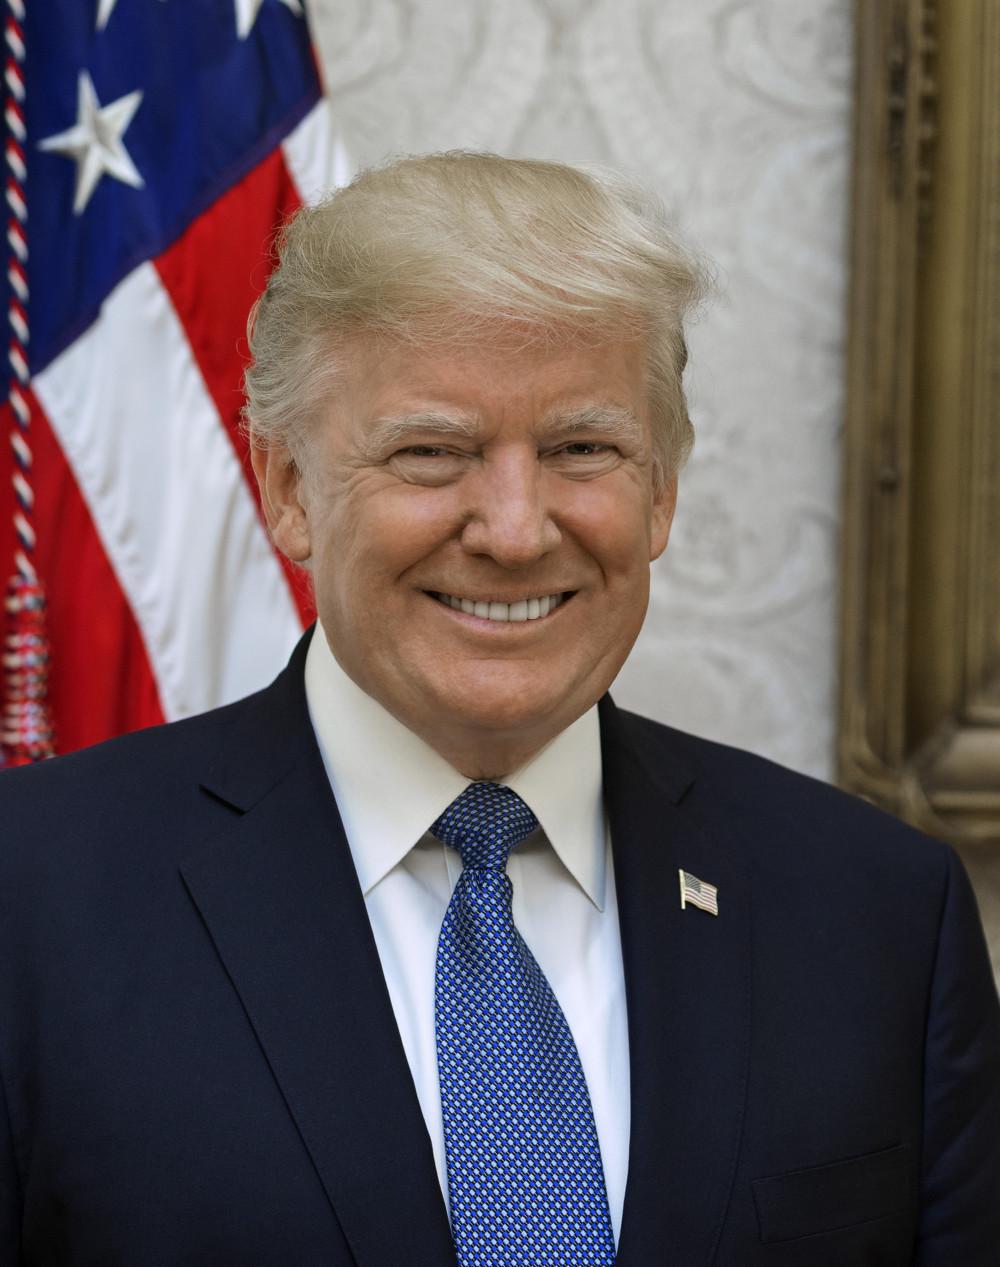 President Trump attending NASCAR's Daytona 500